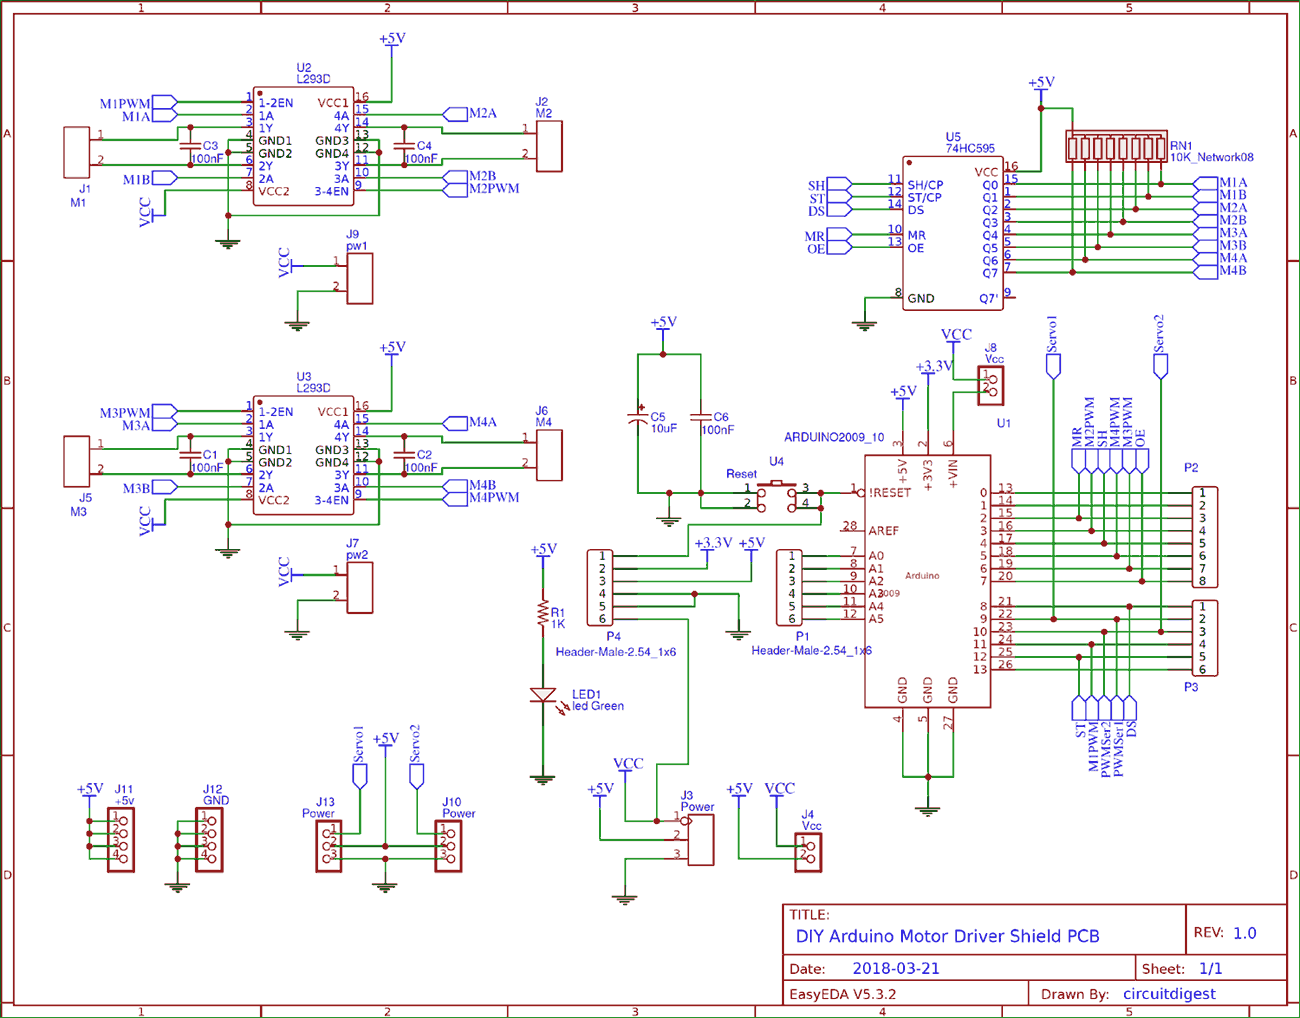 medium resolution of circuit diagram for diy arduino motor driver shield pcb